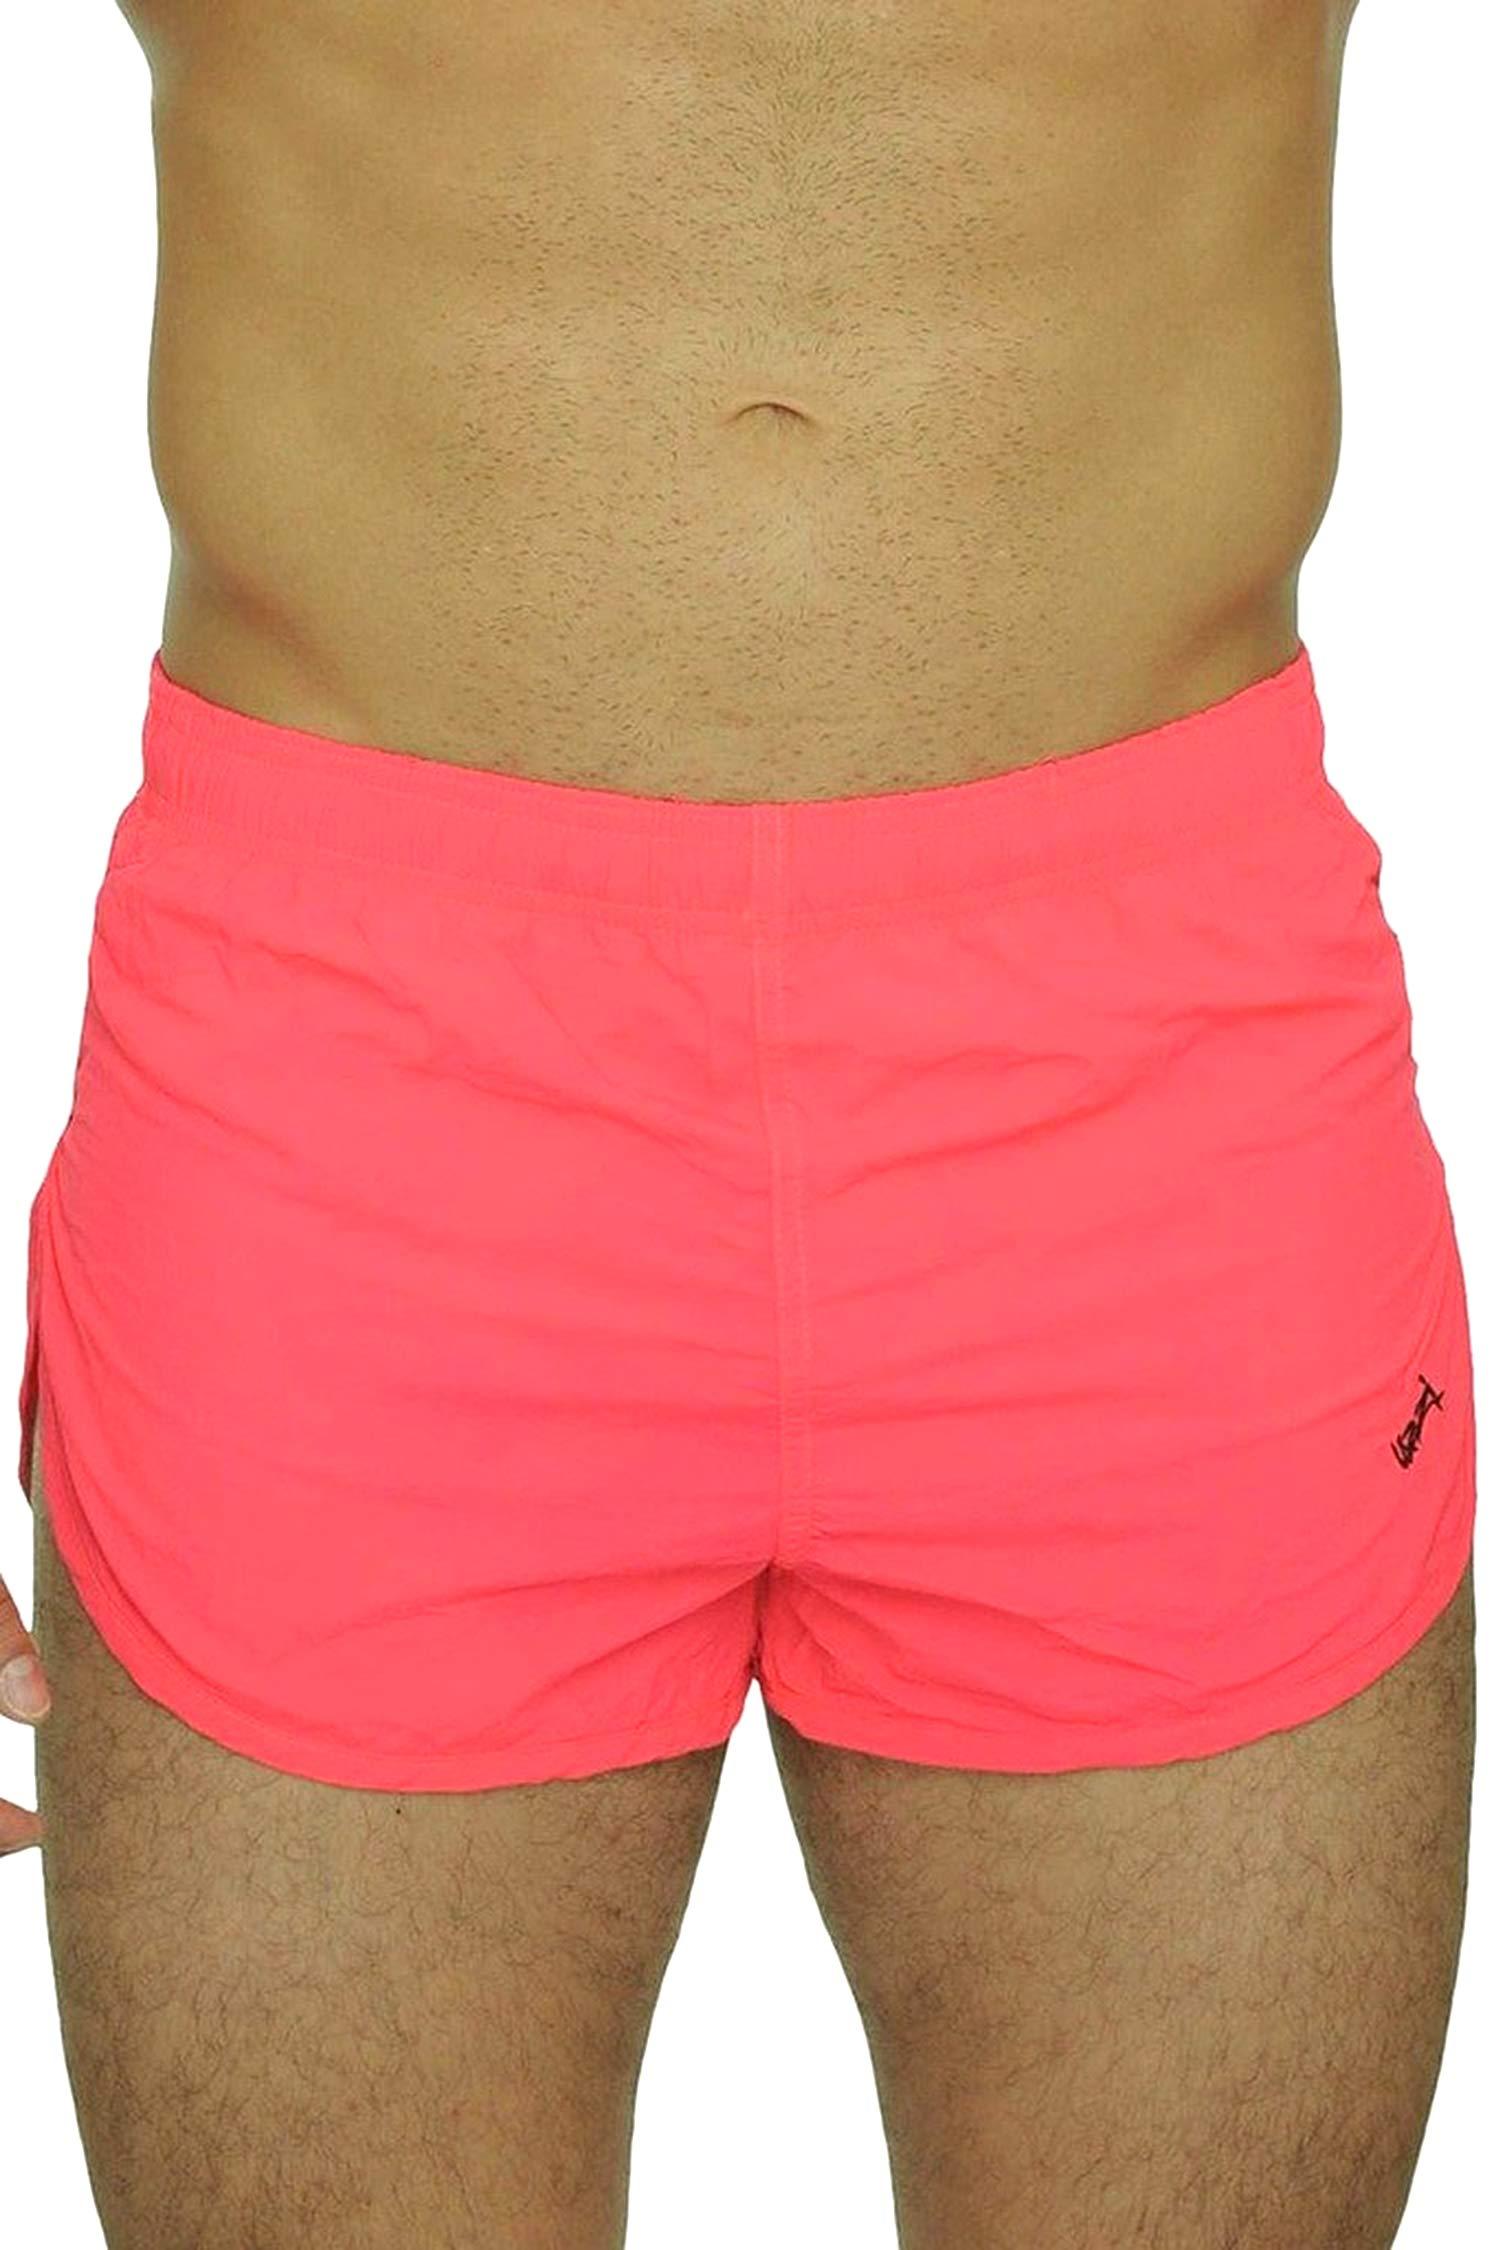 UZZI Men's Running Shorts Swimwear Trunks